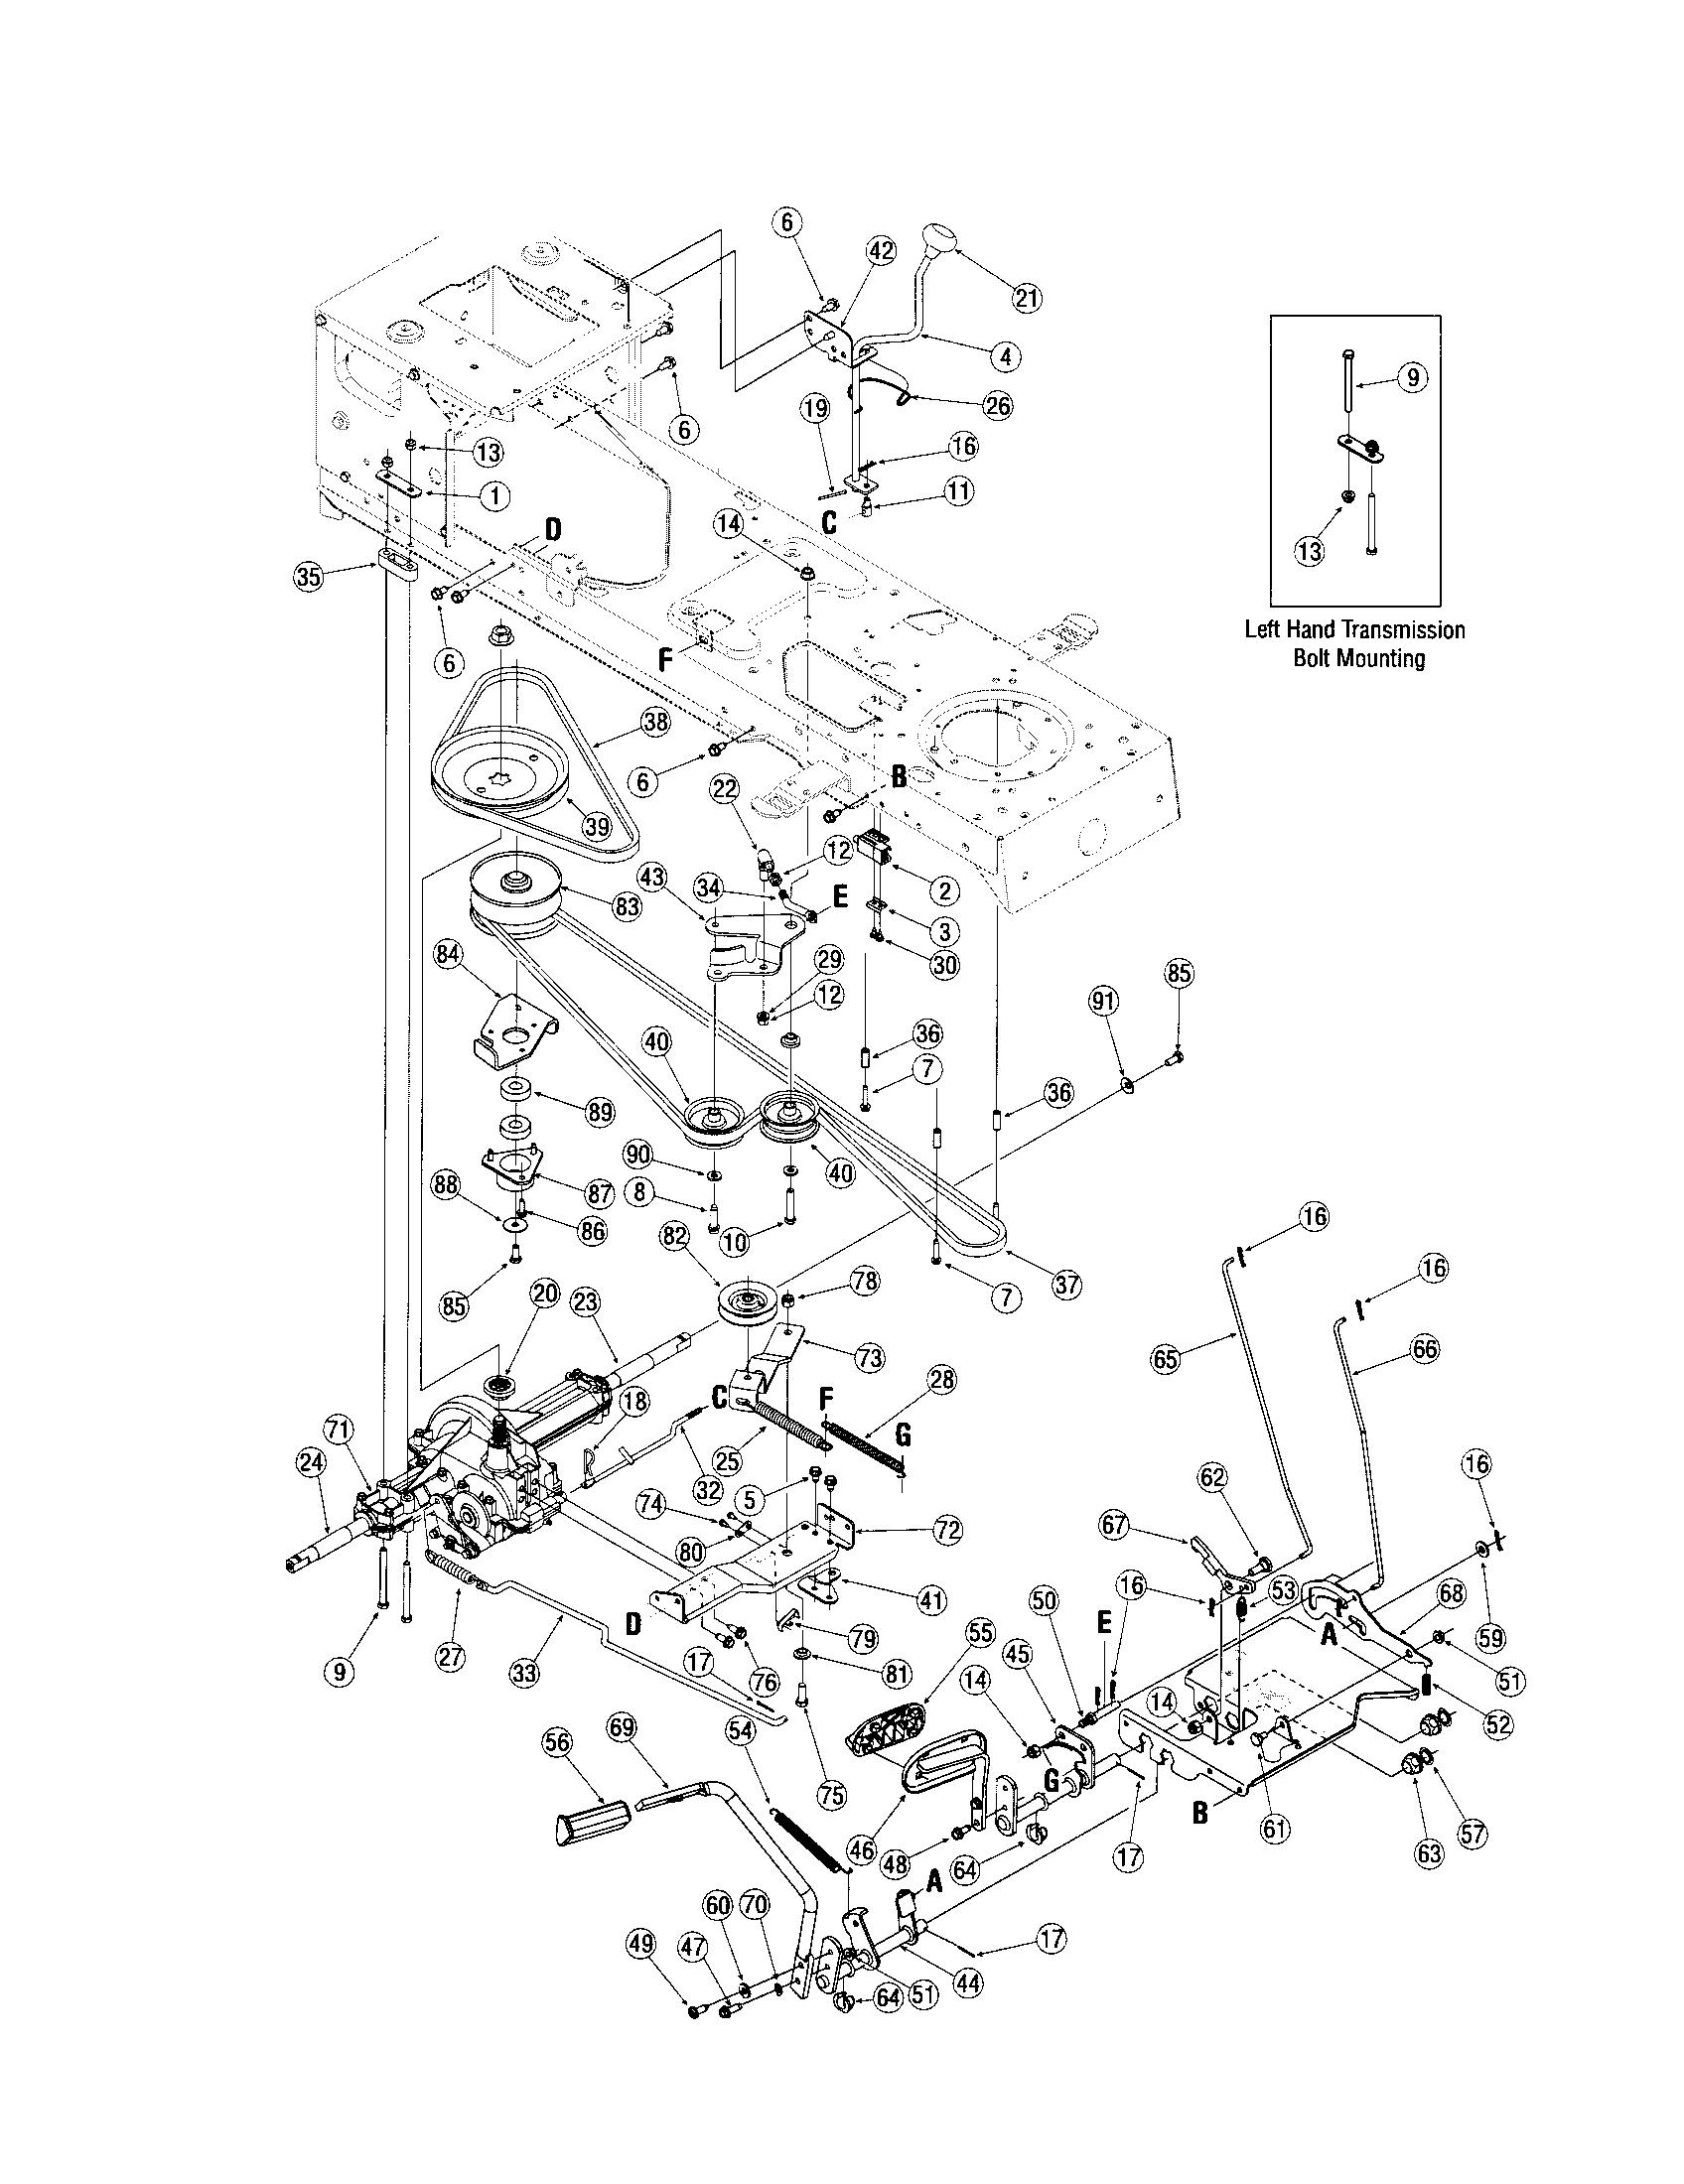 TRANSMISSION Diagram & Parts List for Model lx420 Toro ...